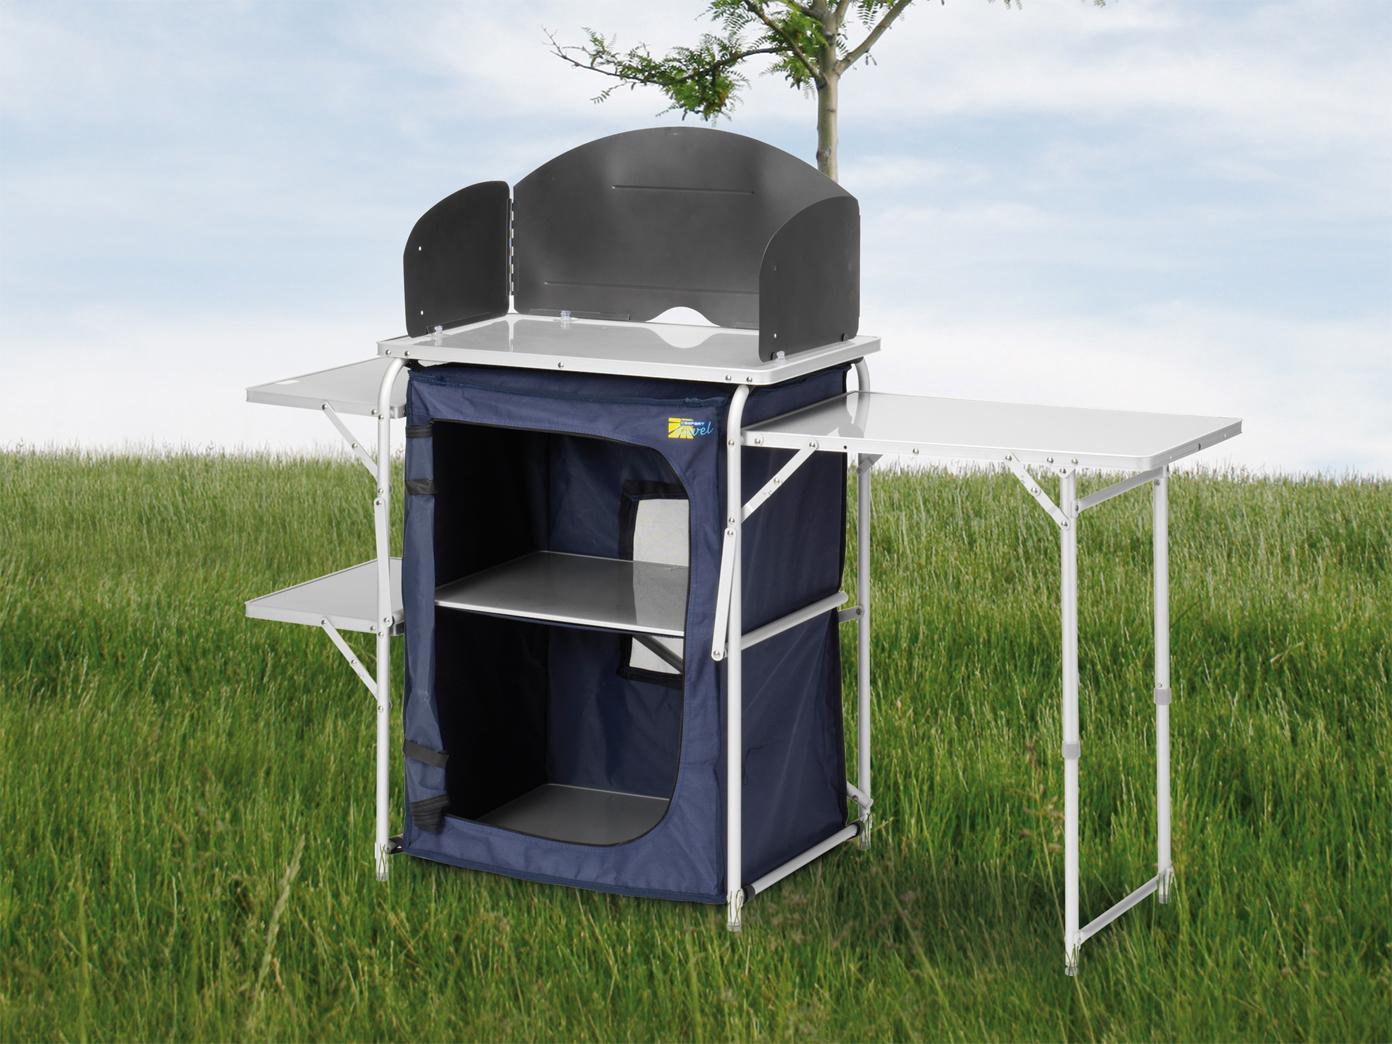 Campingküche multifunktional Campingmöbel 143x48cm Reiseküche Outdoorküche Outdoorküche Outdoorküche d6fc4f